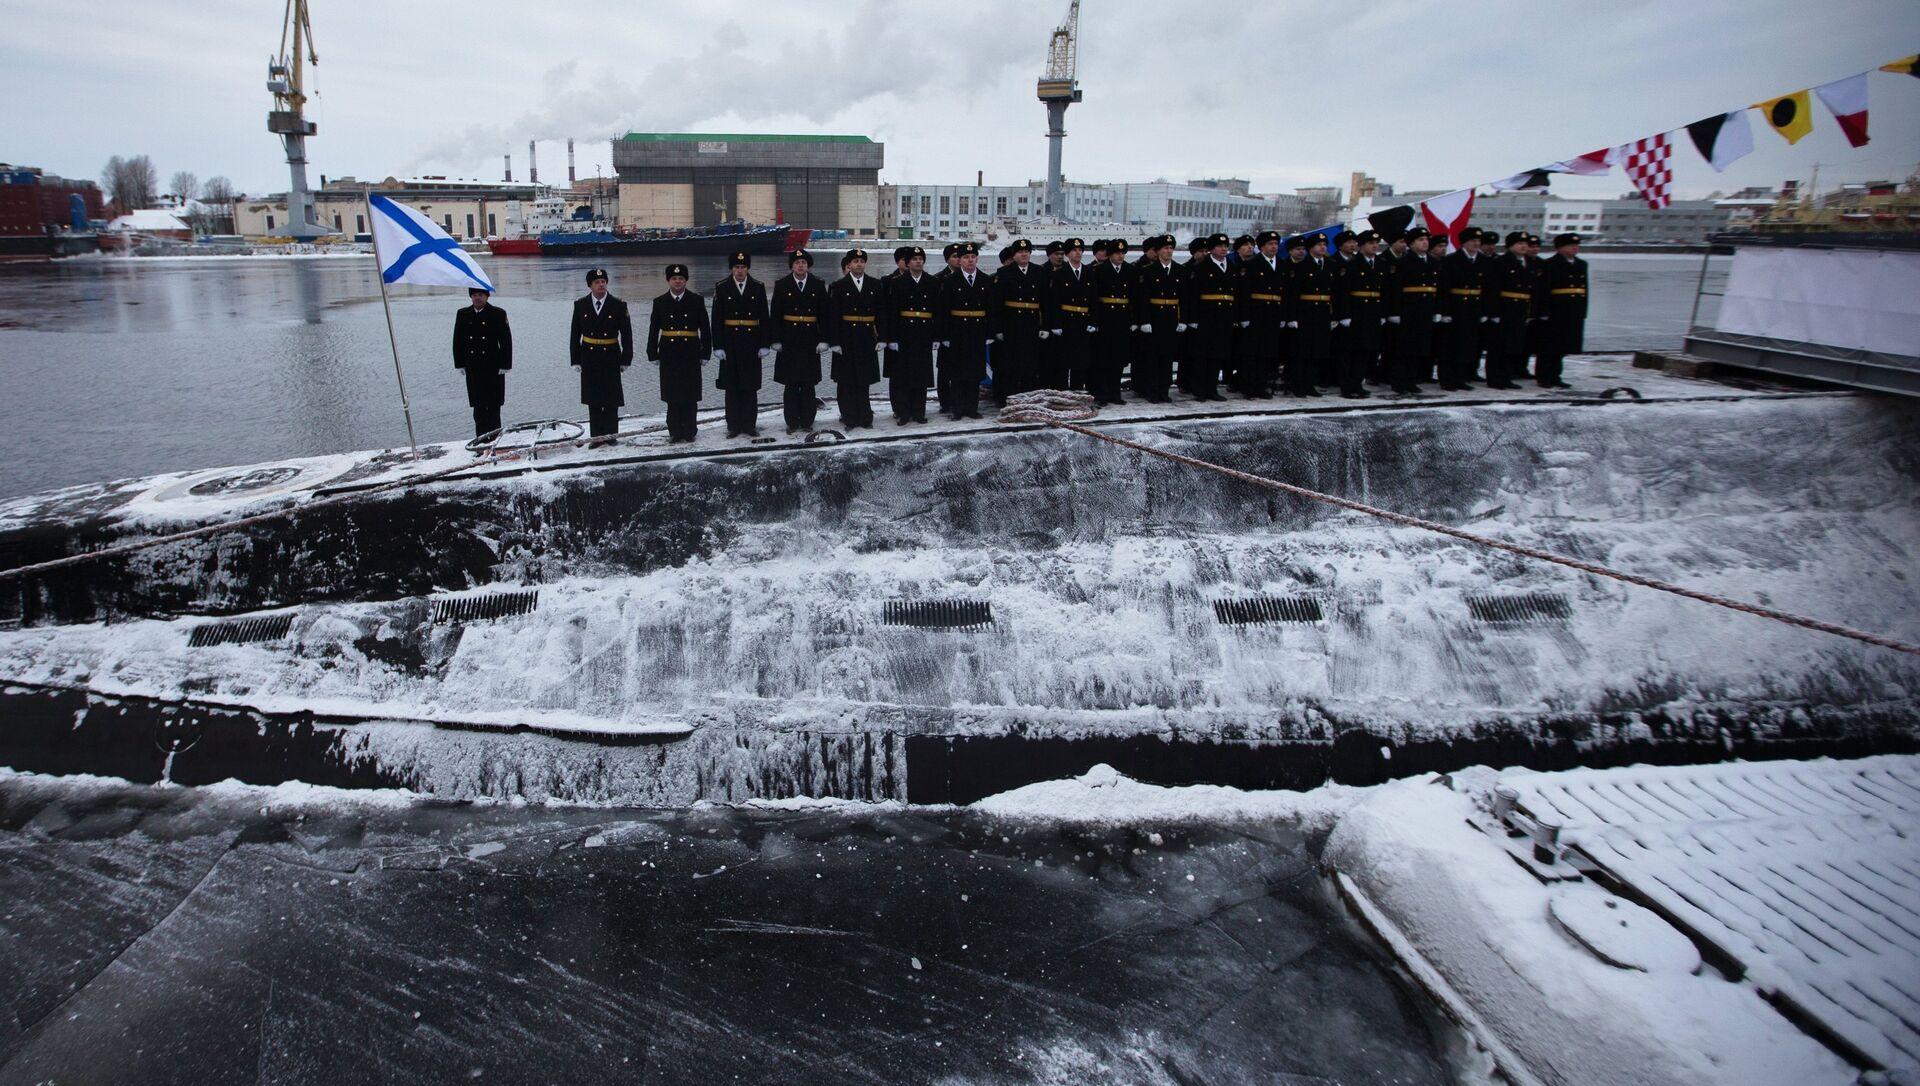 Церемония подъема Военно-морского флага на борту подводной лодки Ростов-на-Дону - Sputnik Latvija, 1920, 22.03.2021